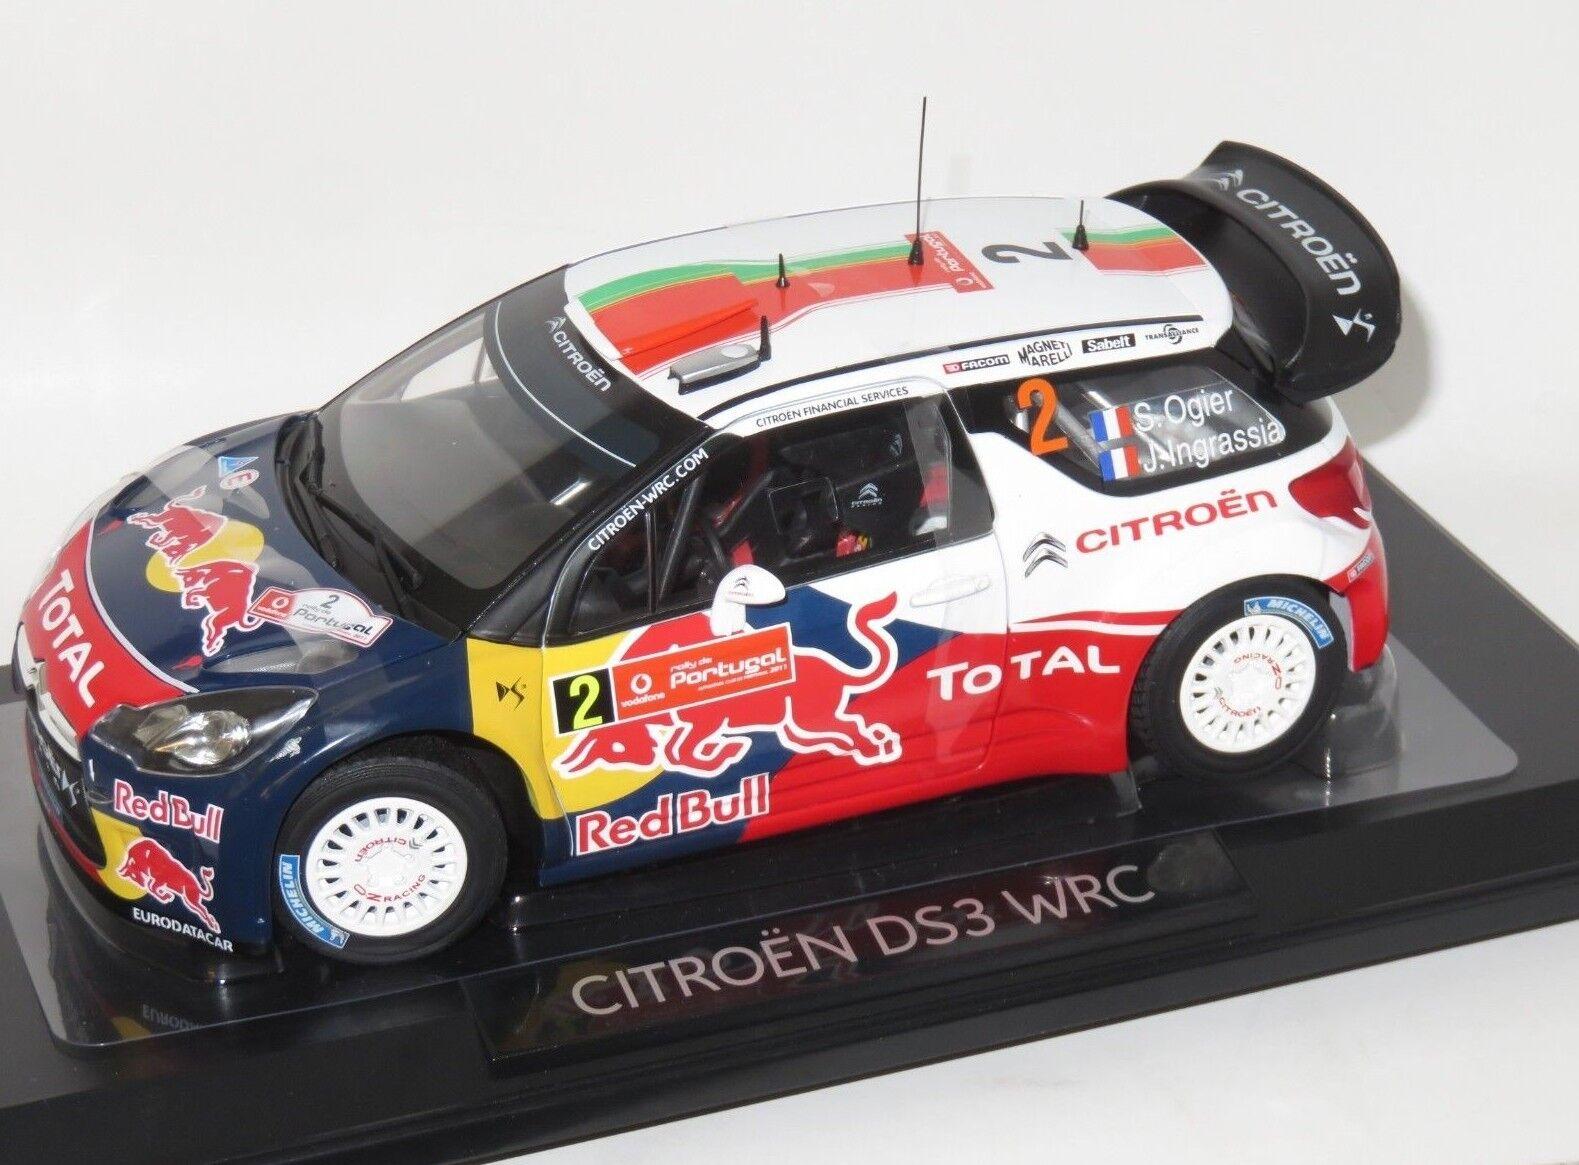 estilo clásico 1 18 Citroen Citroen Citroen DS3 WRC rojo Bull ganadores Rally Portugal 2011 S. Ogier  tienda